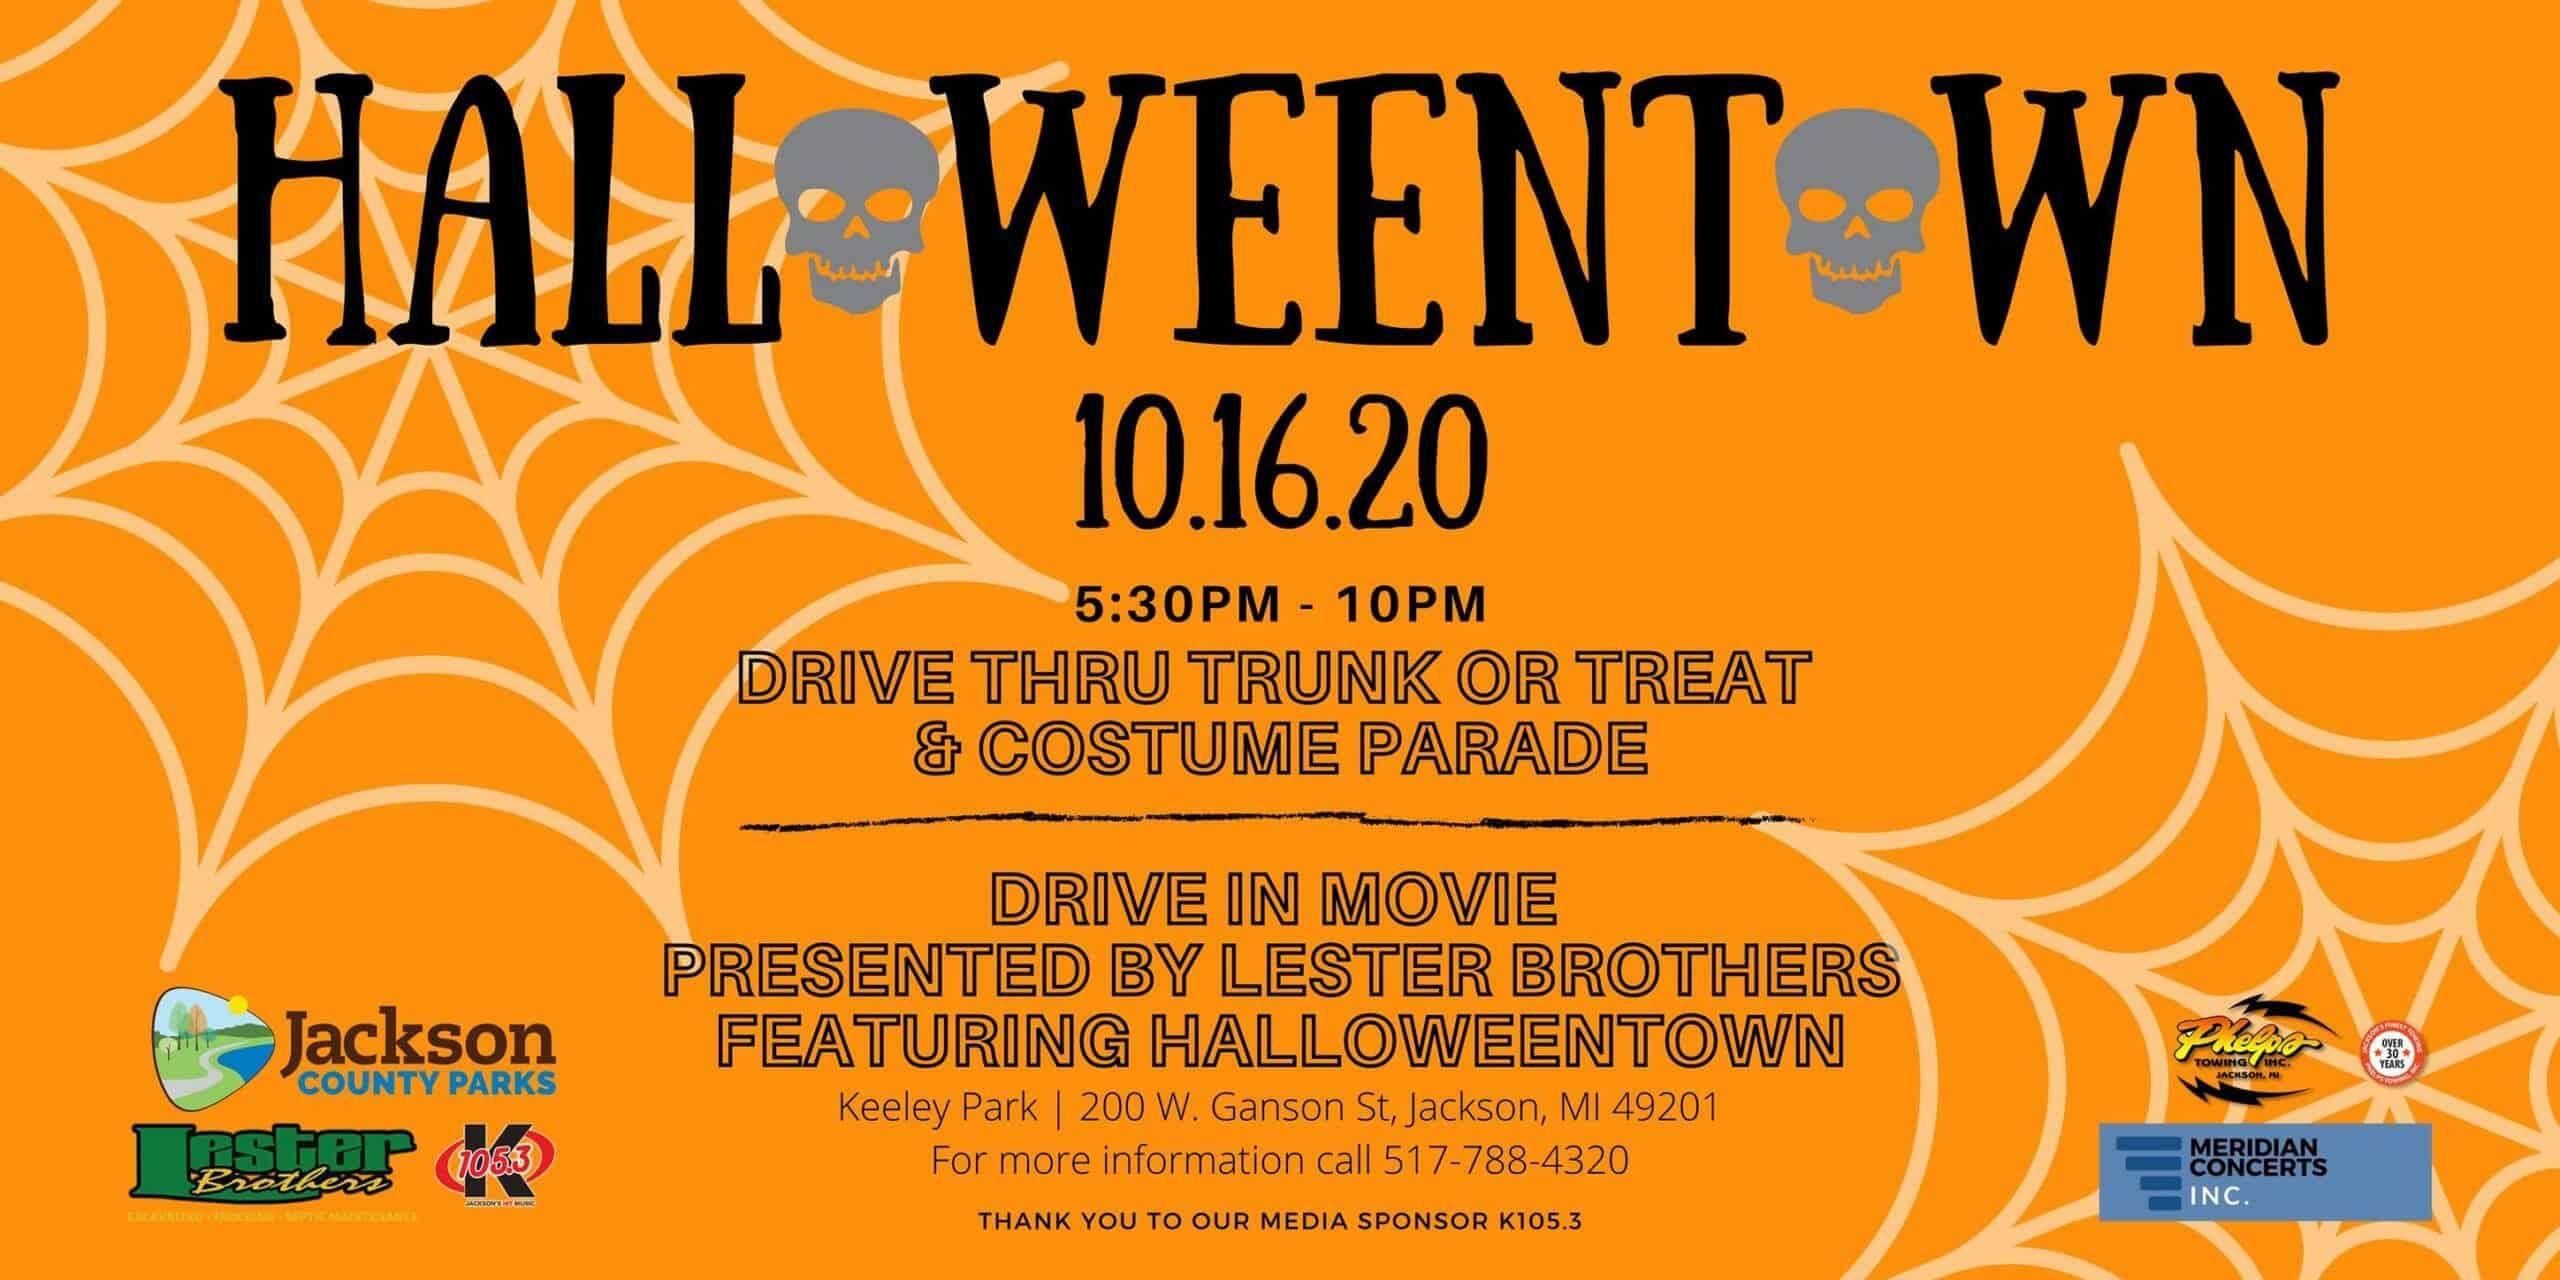 Halloweentown in Jackson County MI